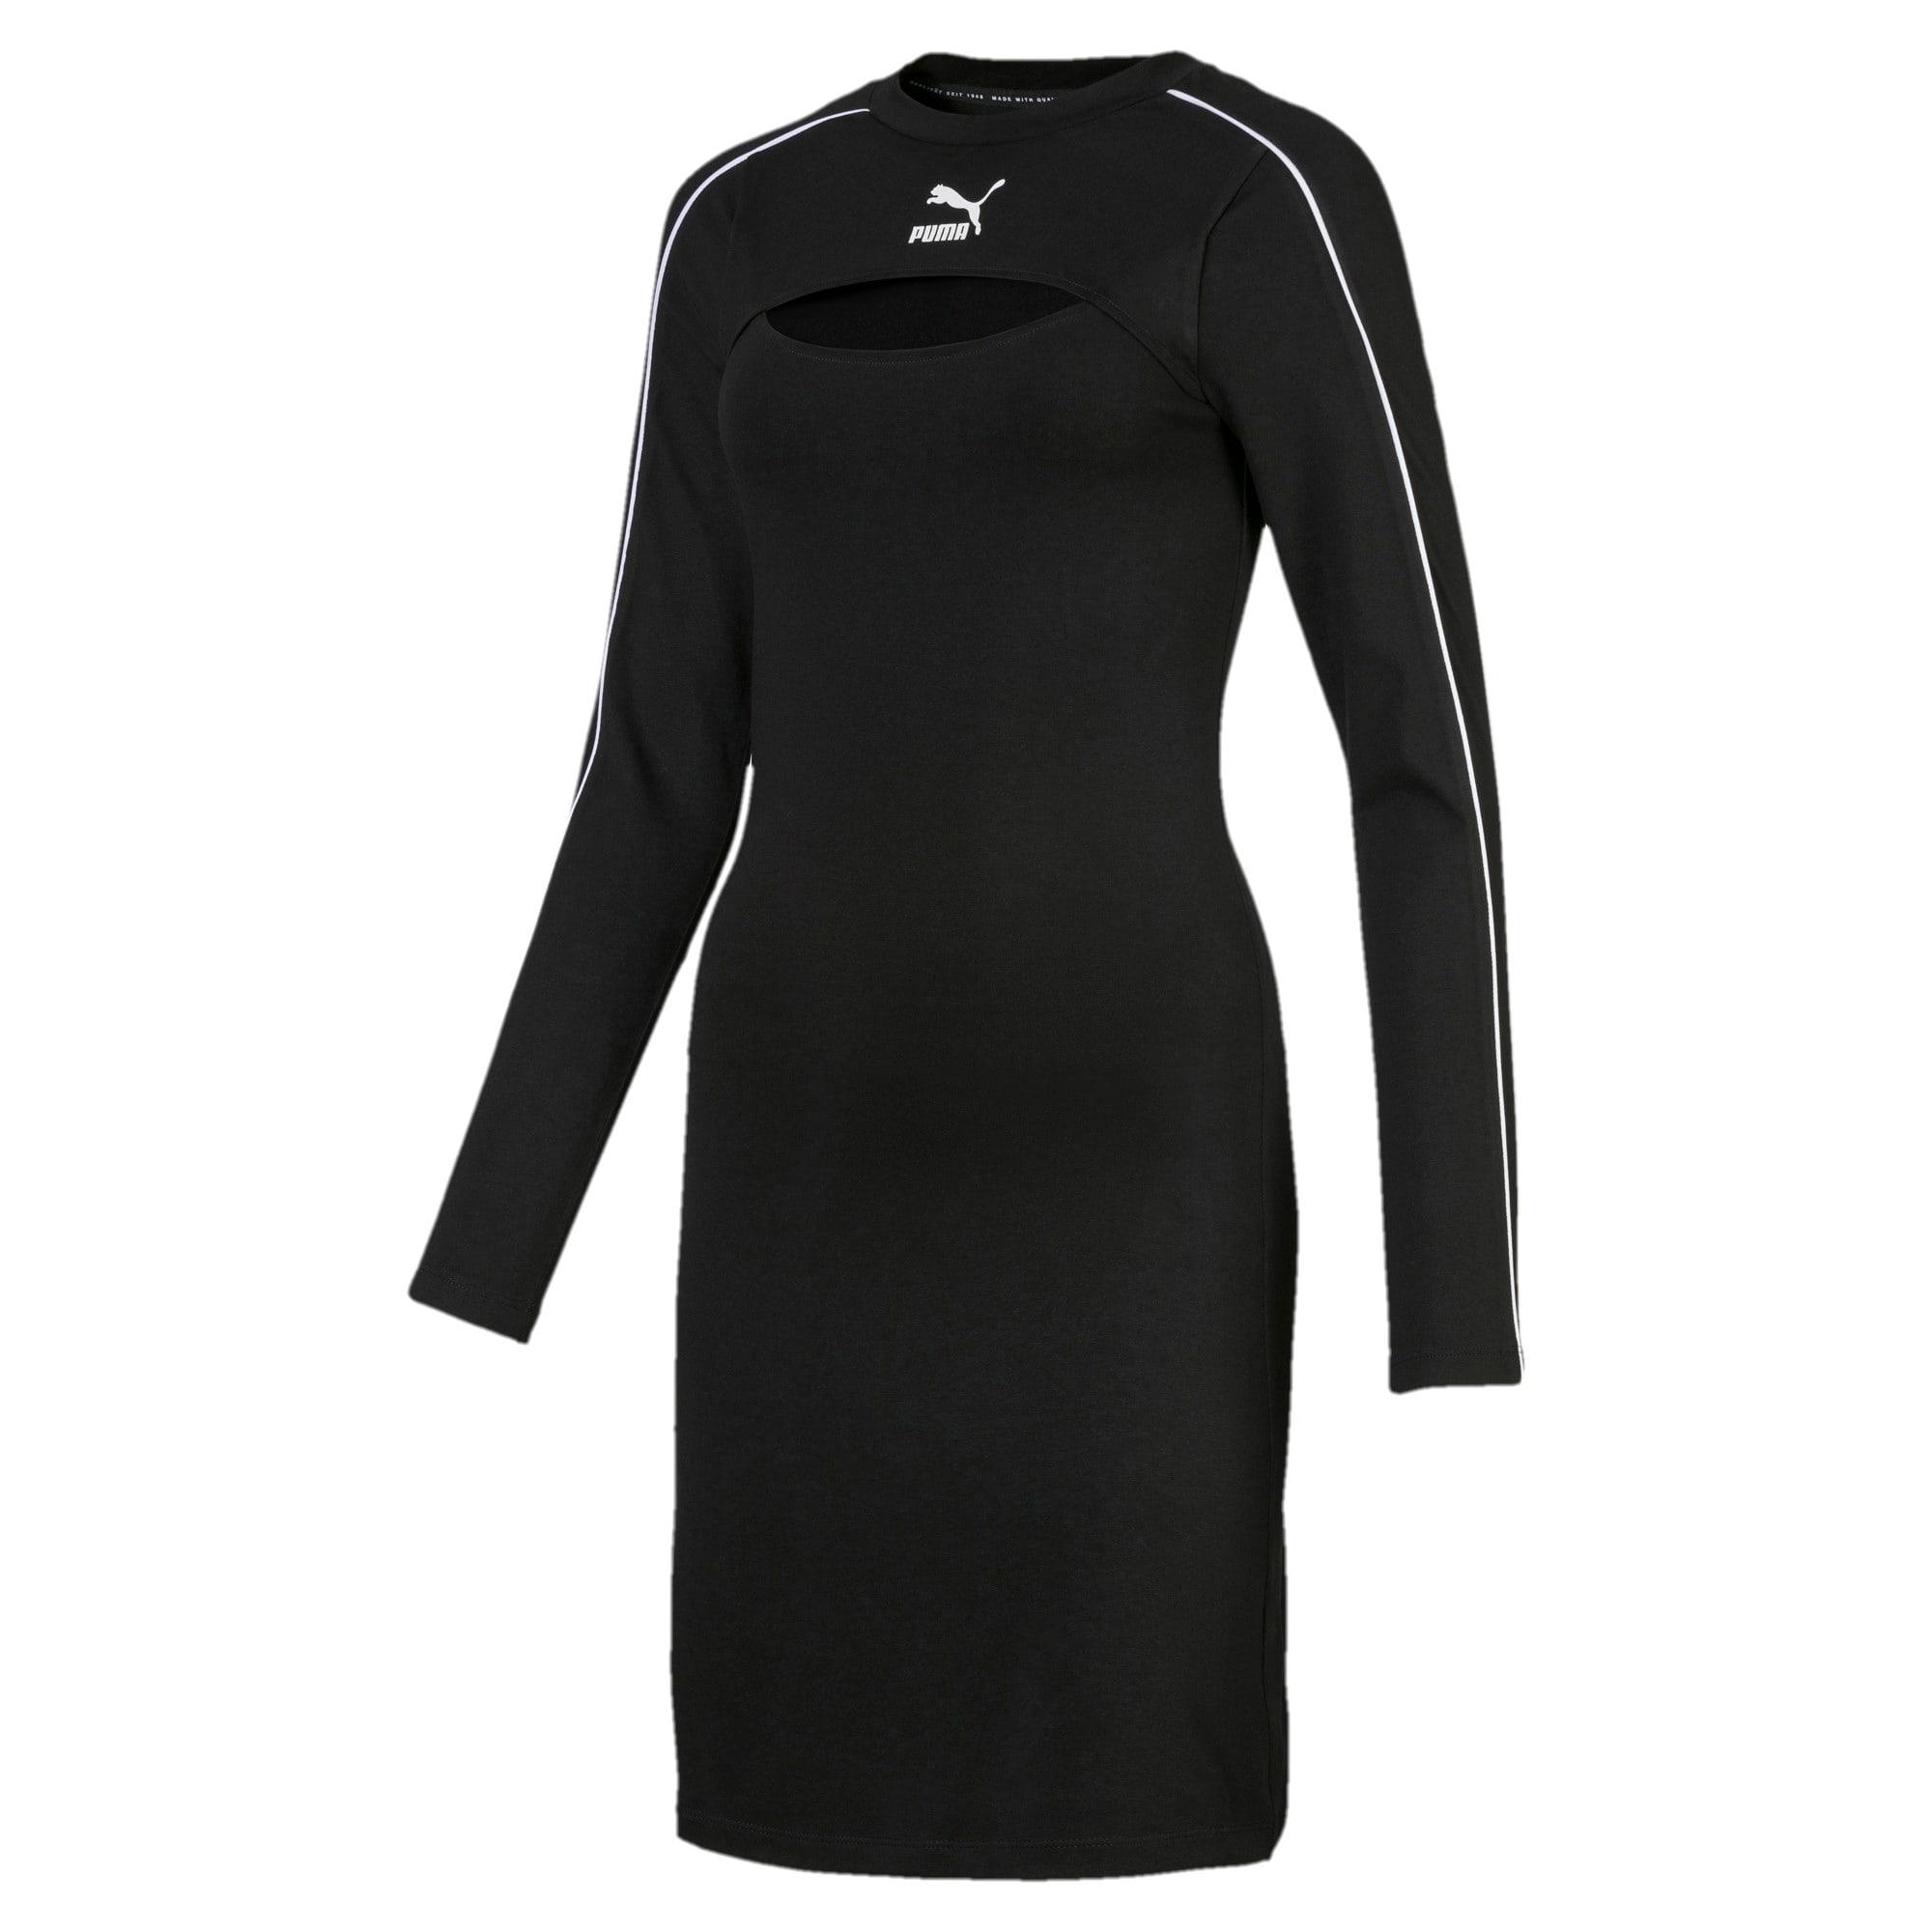 Thumbnail 1 of CLASSICS ウィメンズ ドレス, Cotton Black, medium-JPN